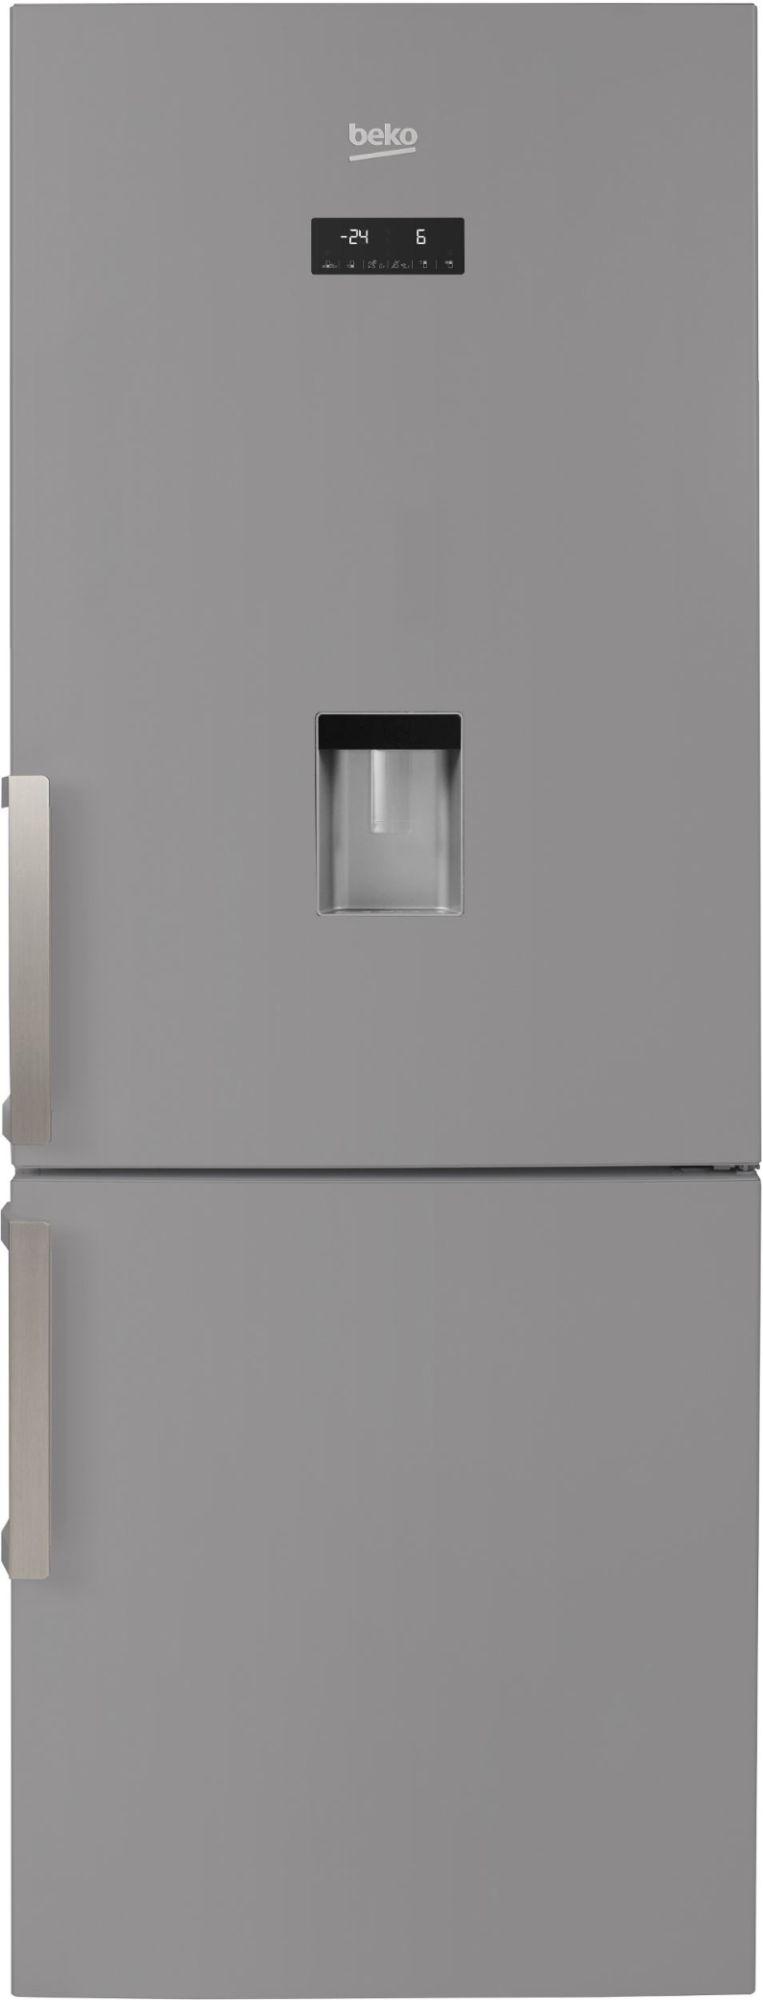 combine inverse beko rcne520e31ds. Black Bedroom Furniture Sets. Home Design Ideas